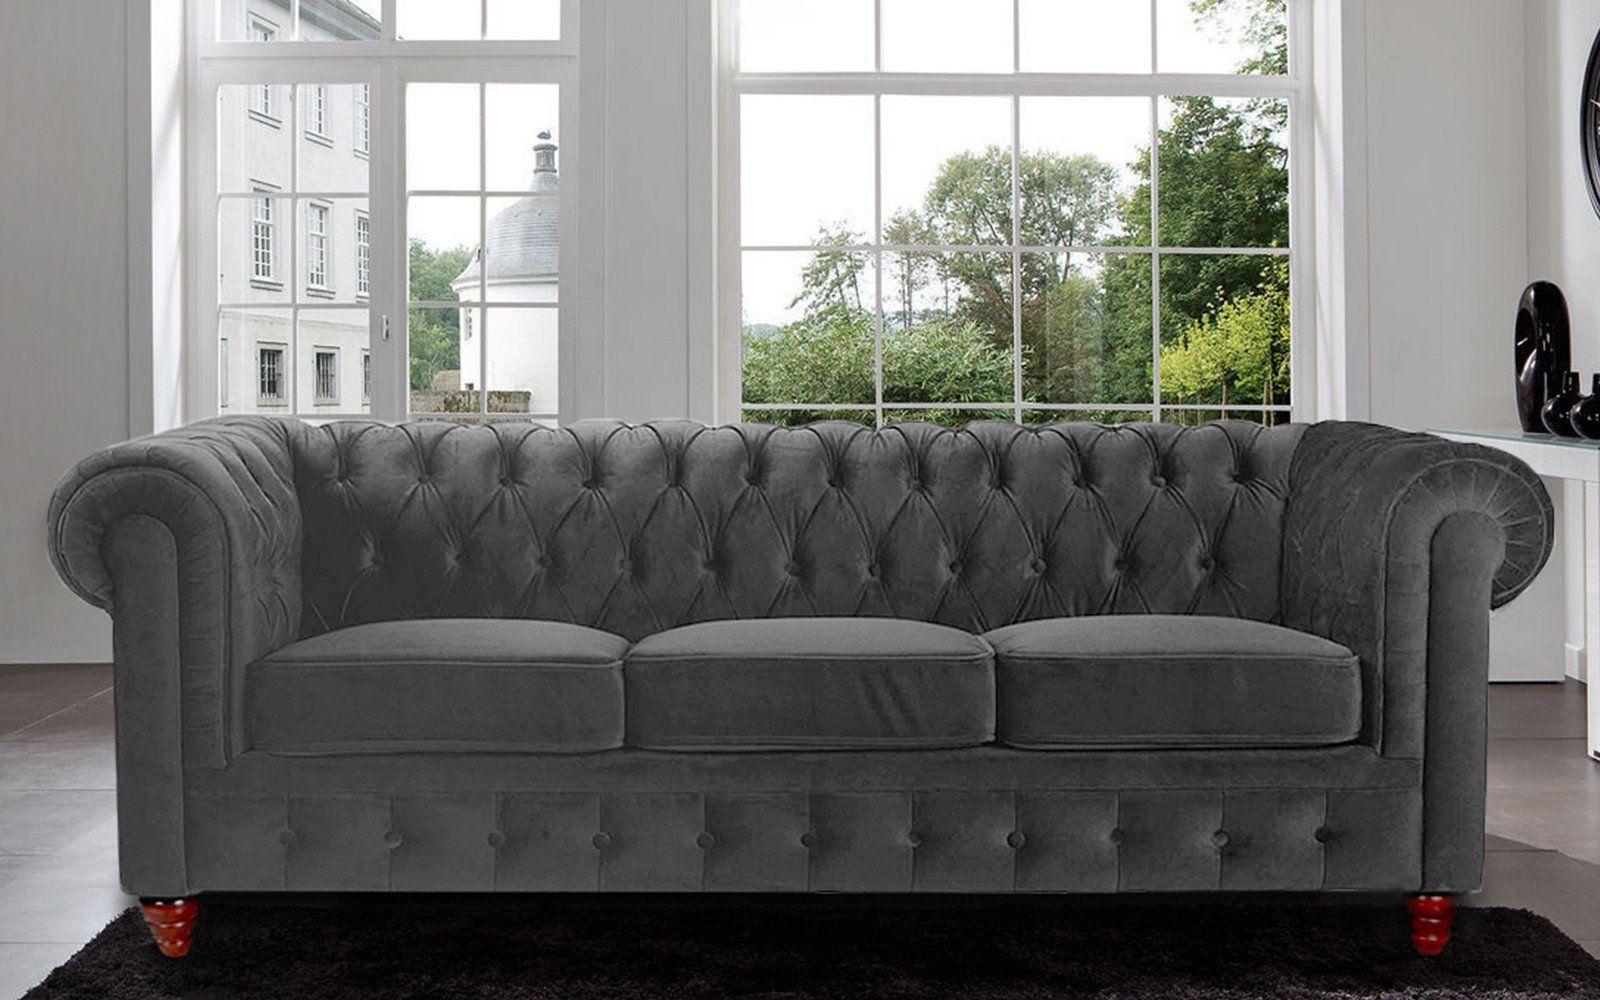 Velvet Chesterfield Sofa Prices Designer Sets With In Delhi Charleston Classic Grey Apartment